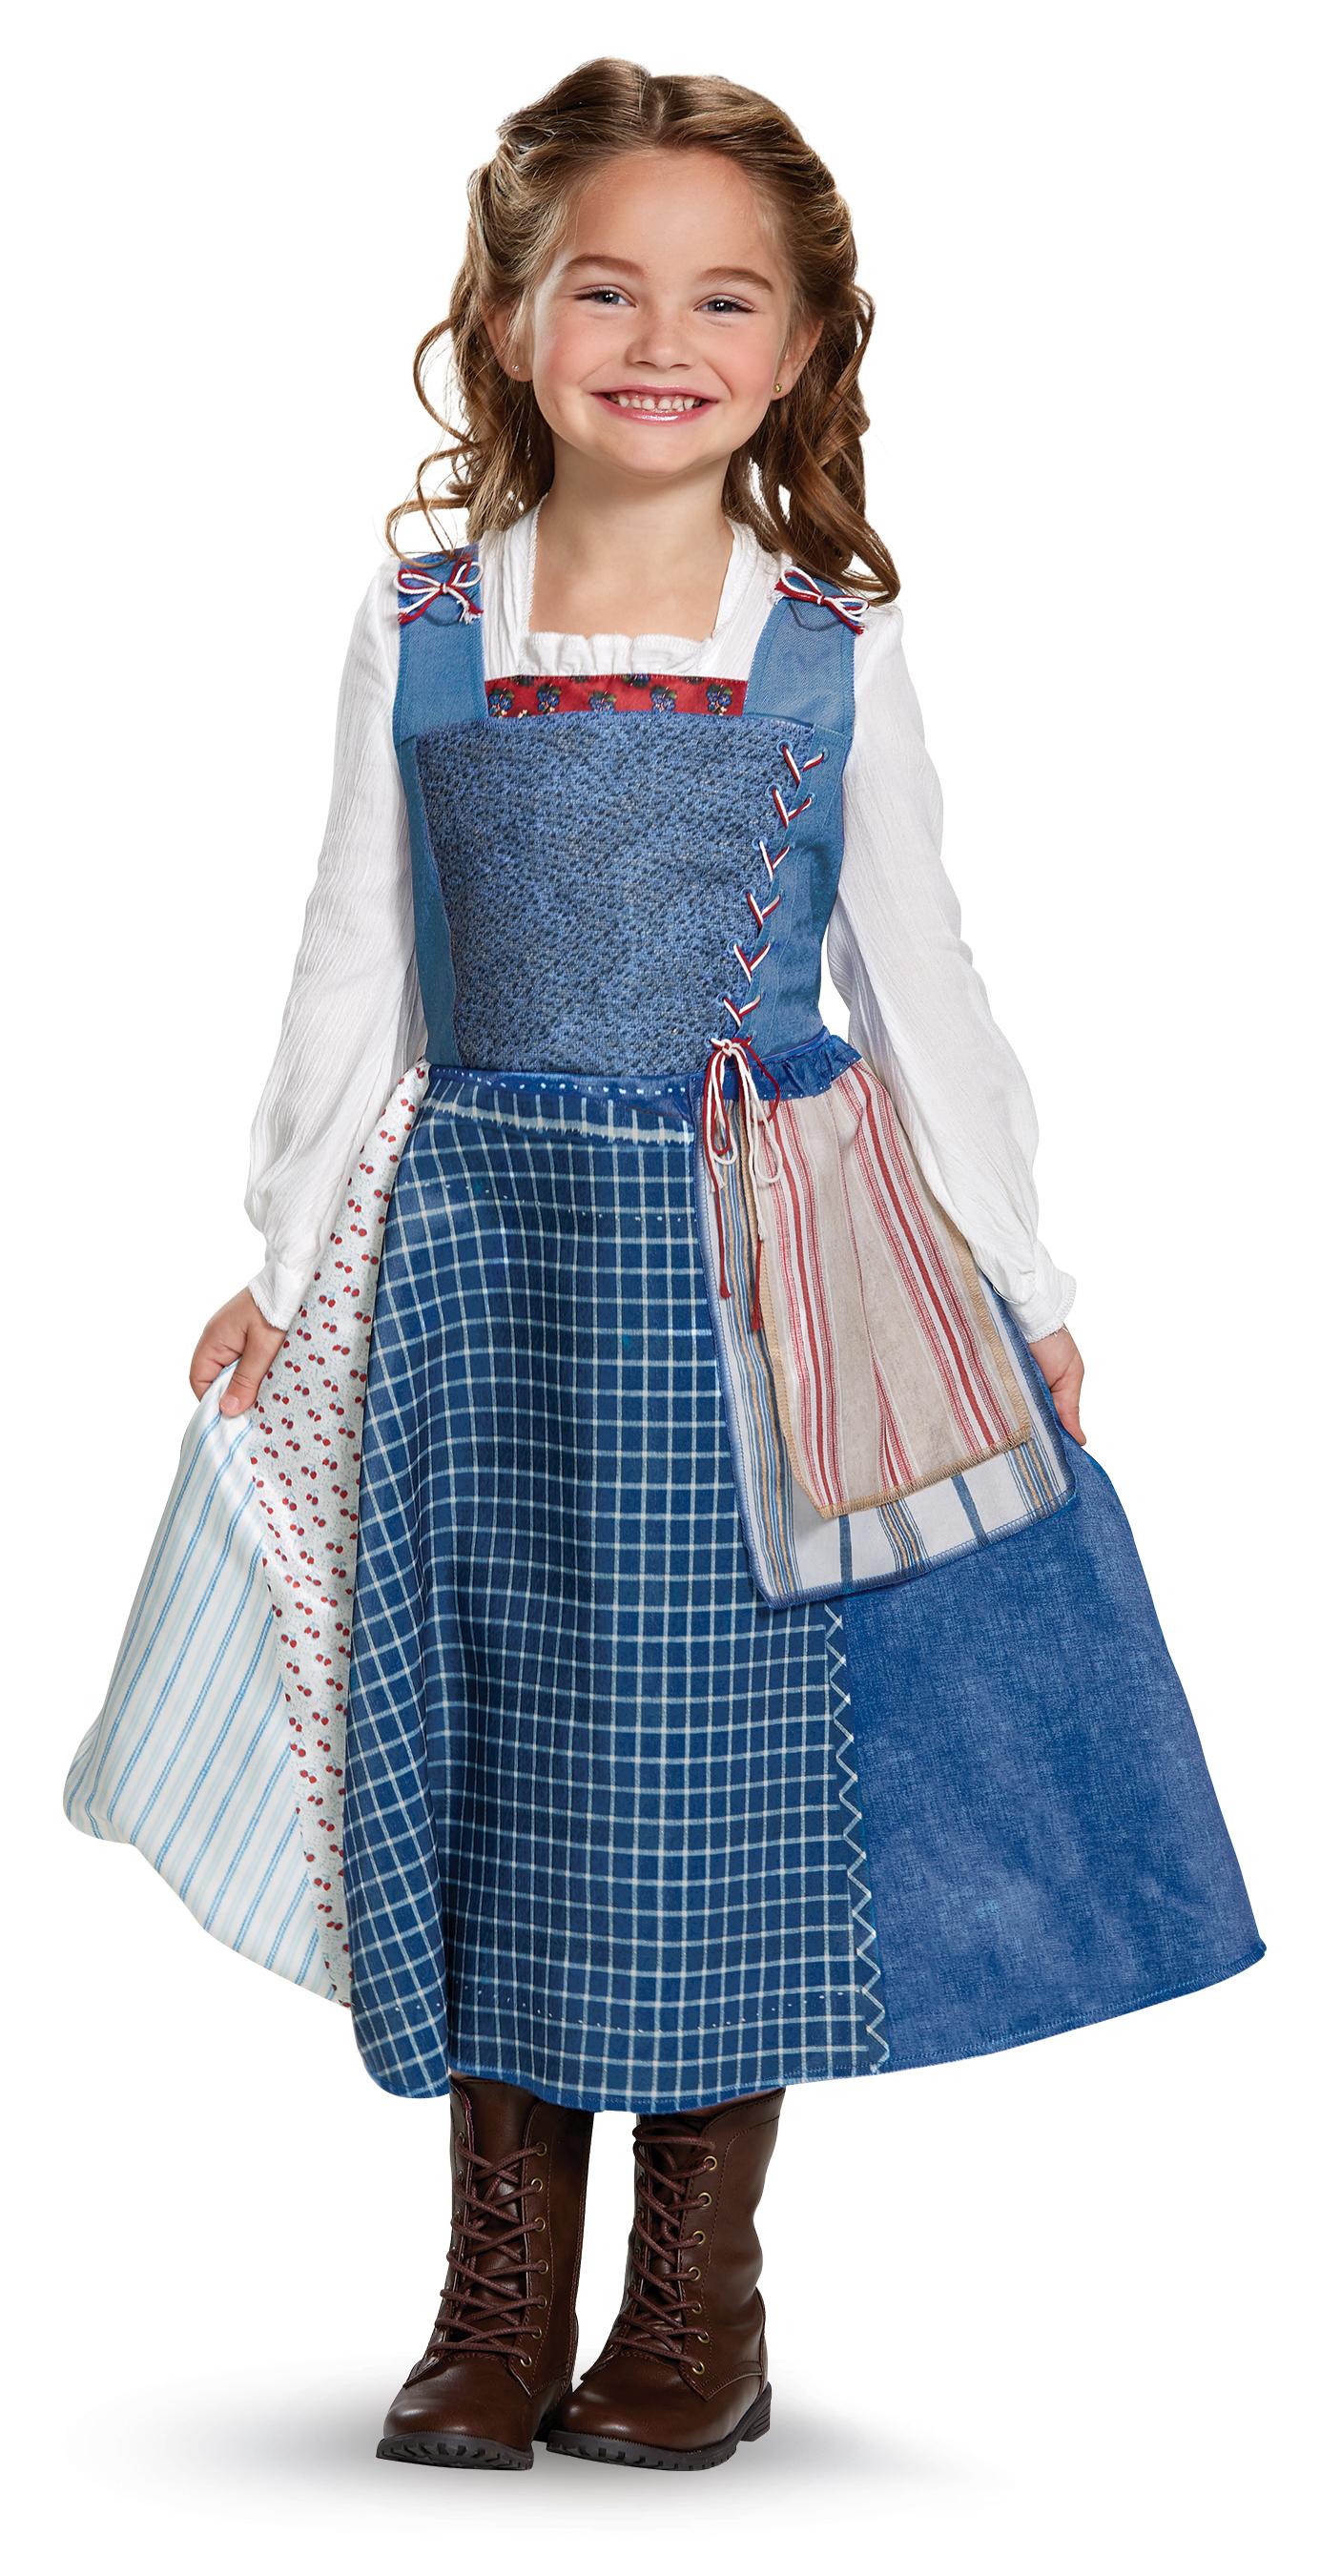 Village Belle Dress For Girls Beauty And The Beast Pinterest